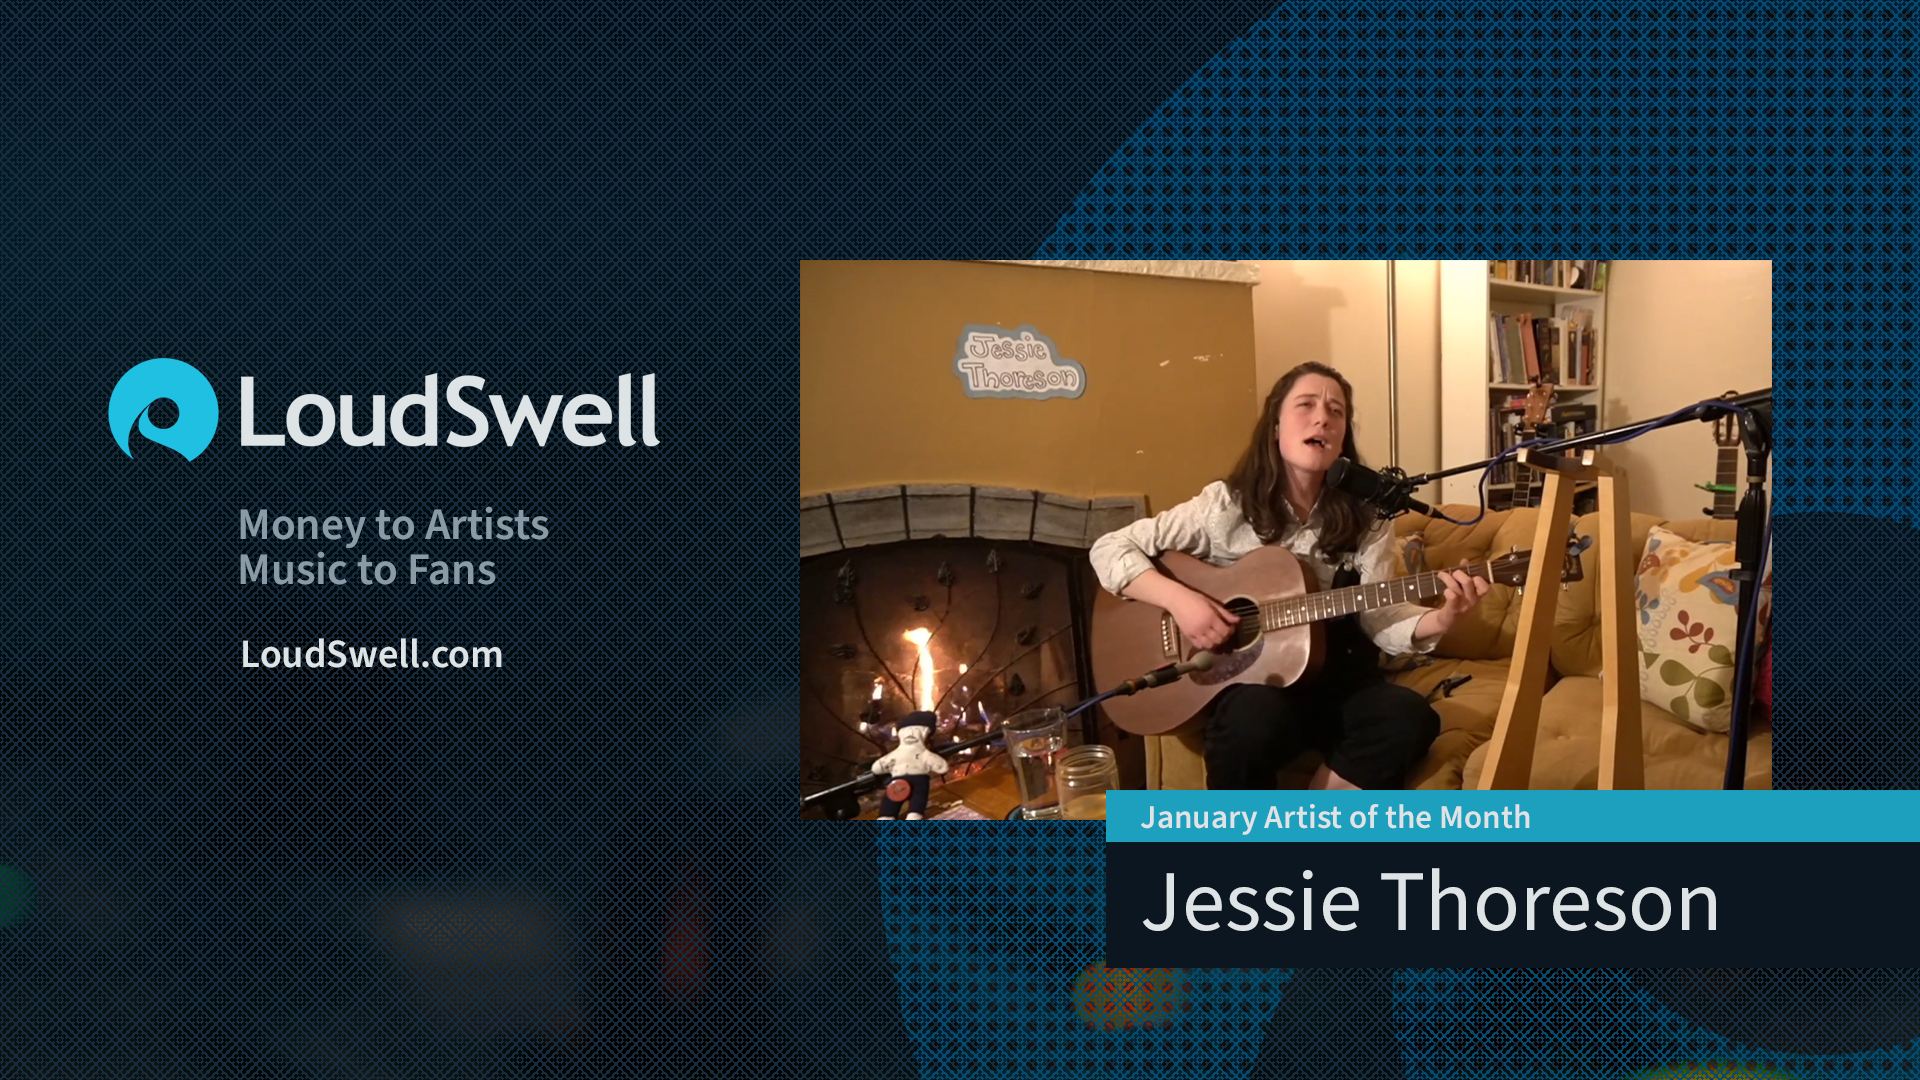 Jesse Thoreson